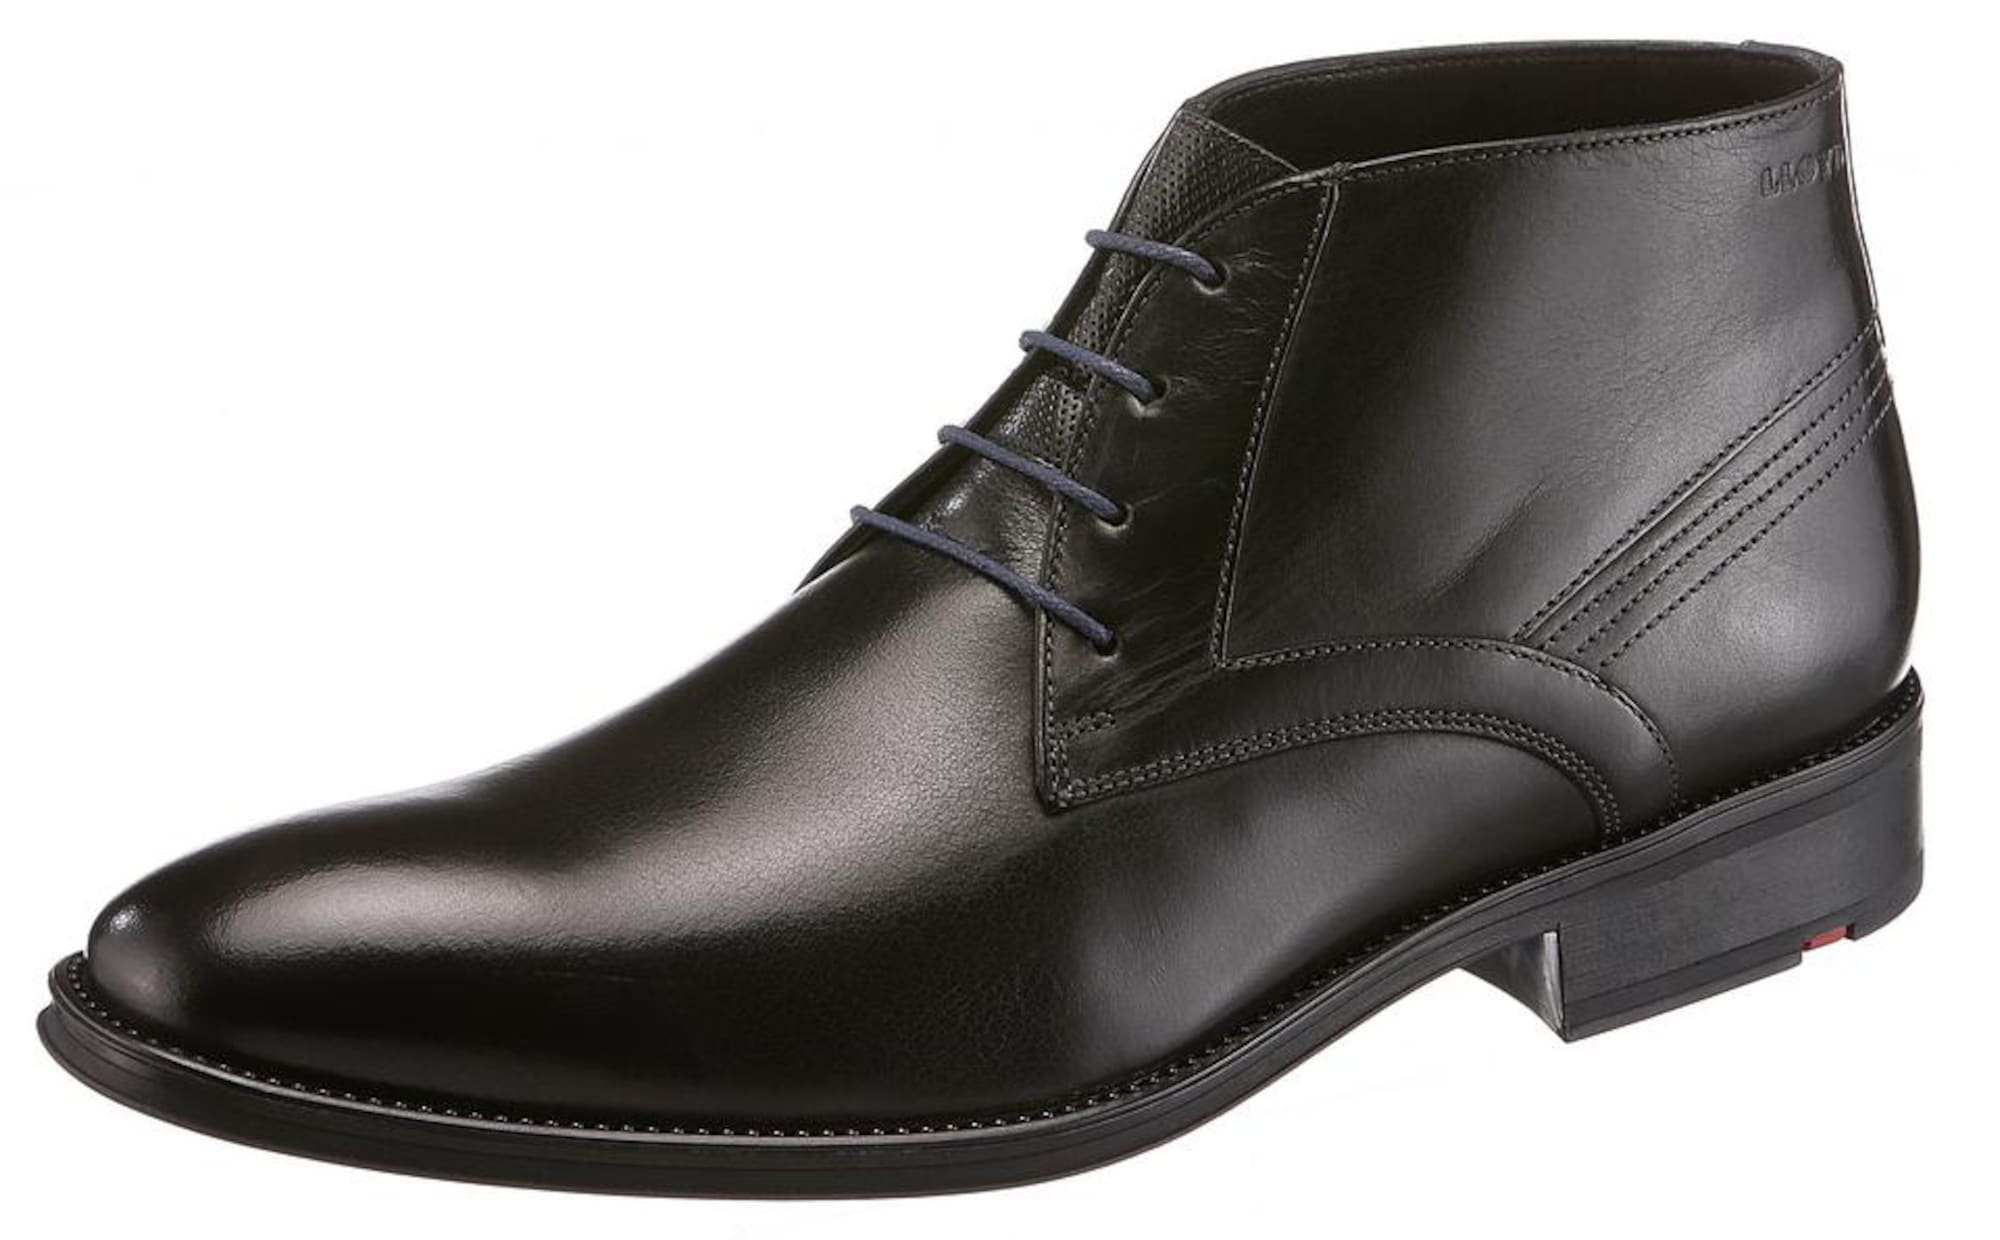 Šněrovací boty Gabun černá LLOYD